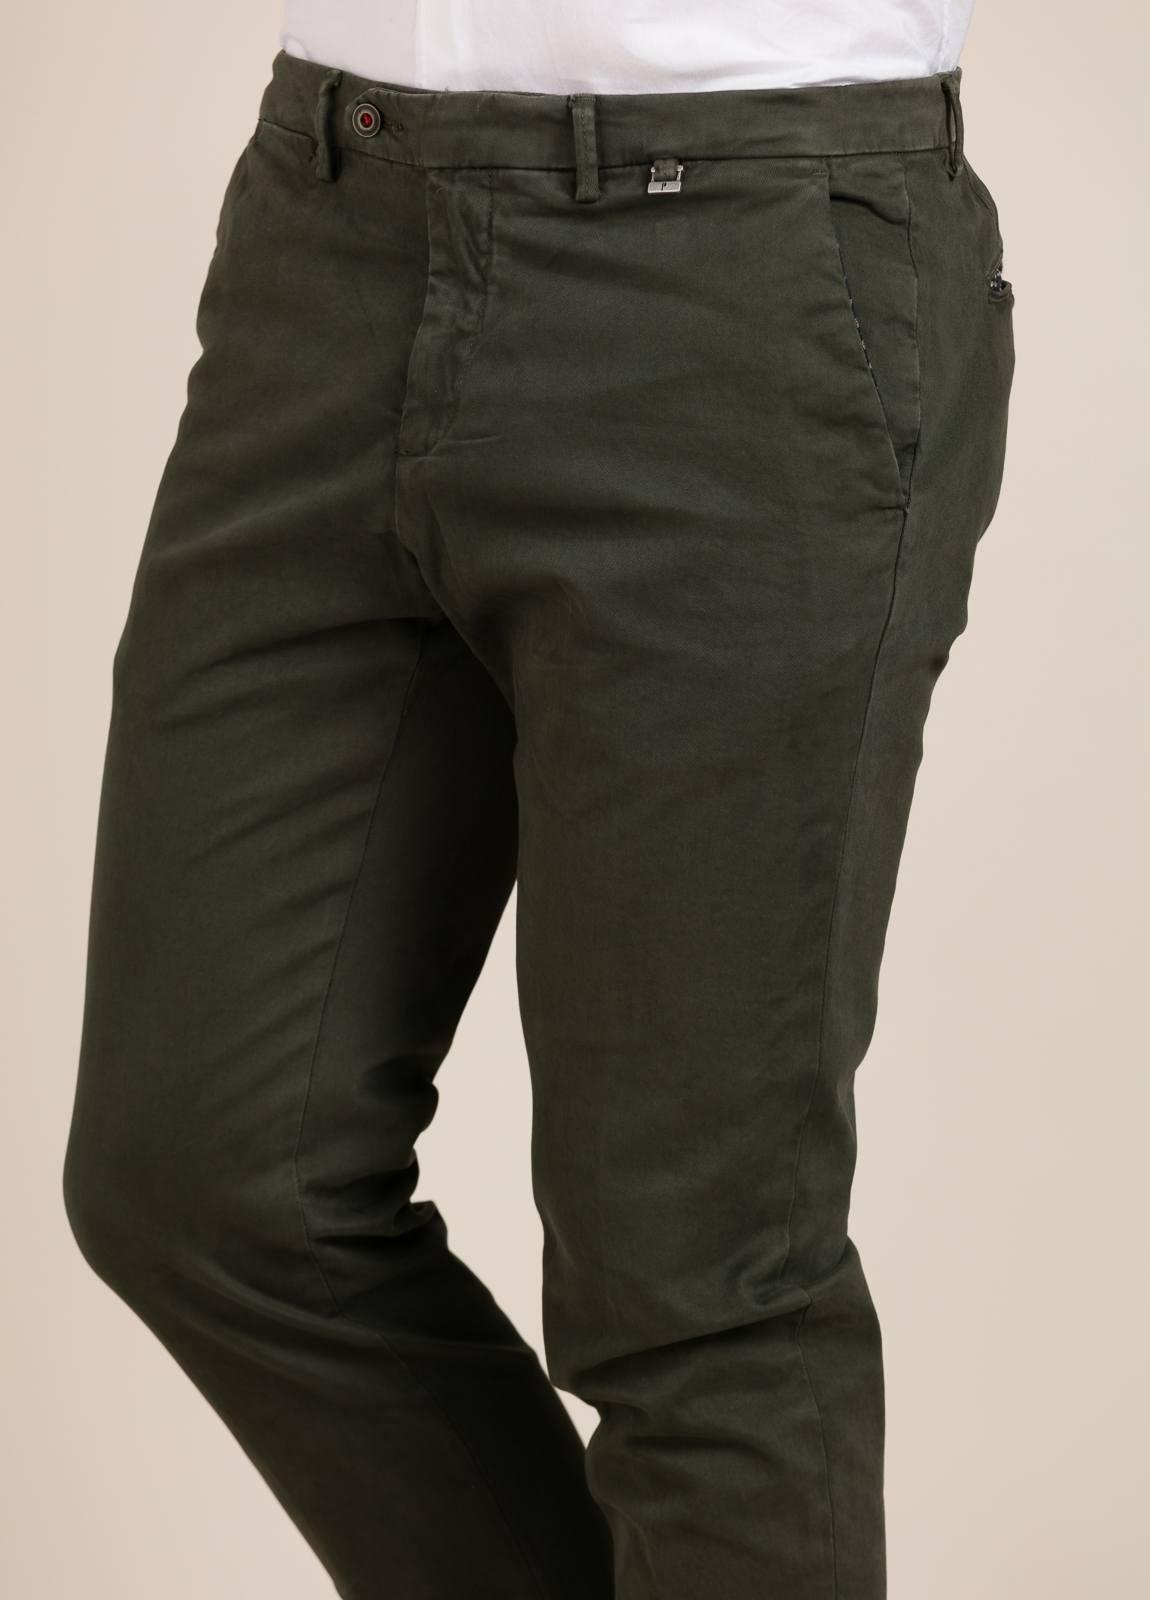 Pantalón chino PAOLONI verde kaki. - Ítem2